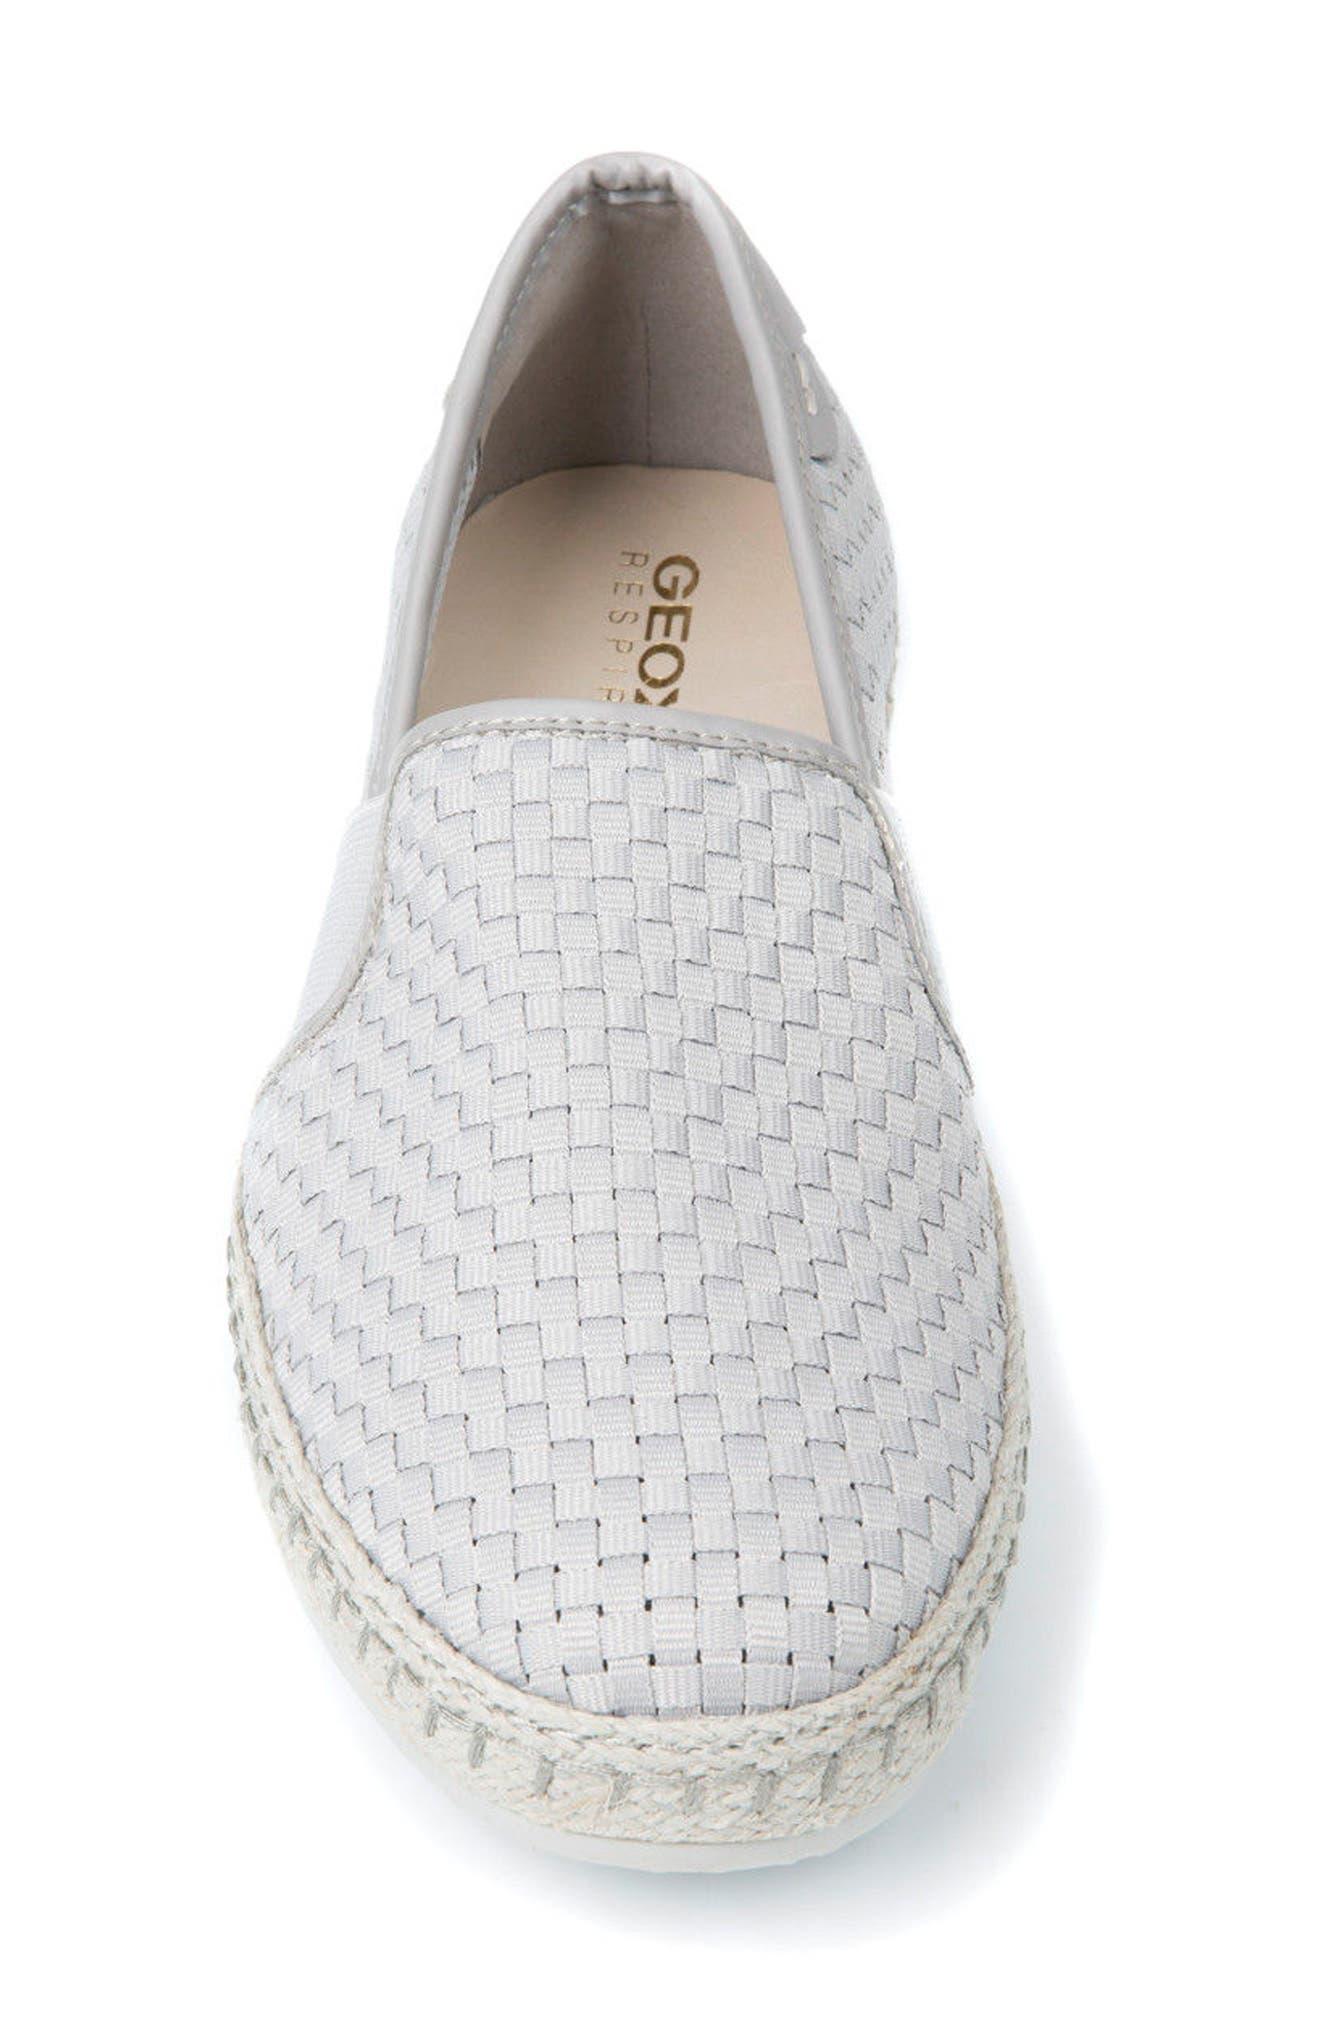 Copacaban 10 Woven Slip-On Sneaker,                             Alternate thumbnail 4, color,                             050